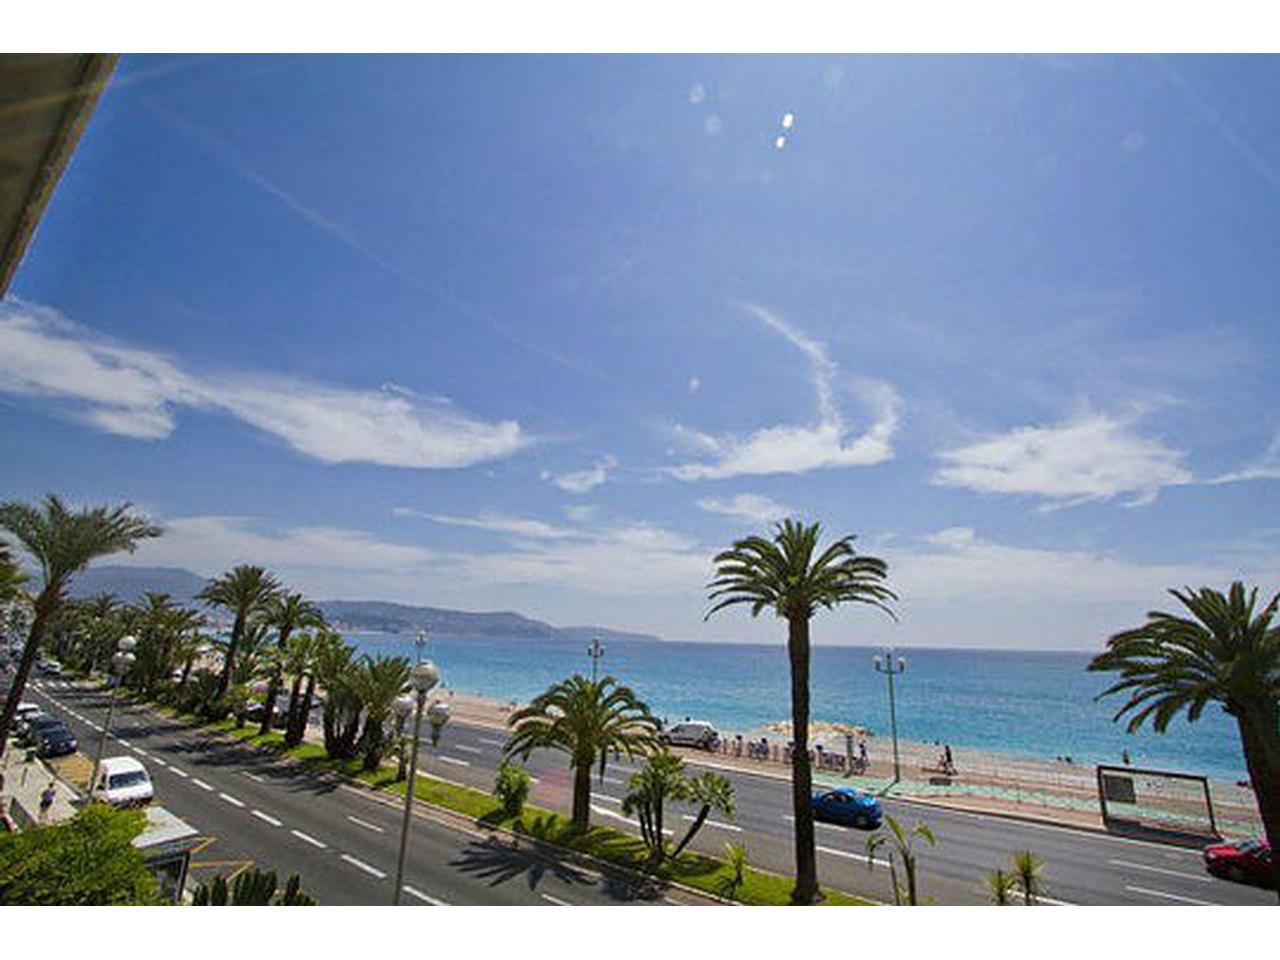 Promenade des anglais 3 pieces RDJ Terrasse/Vue mer